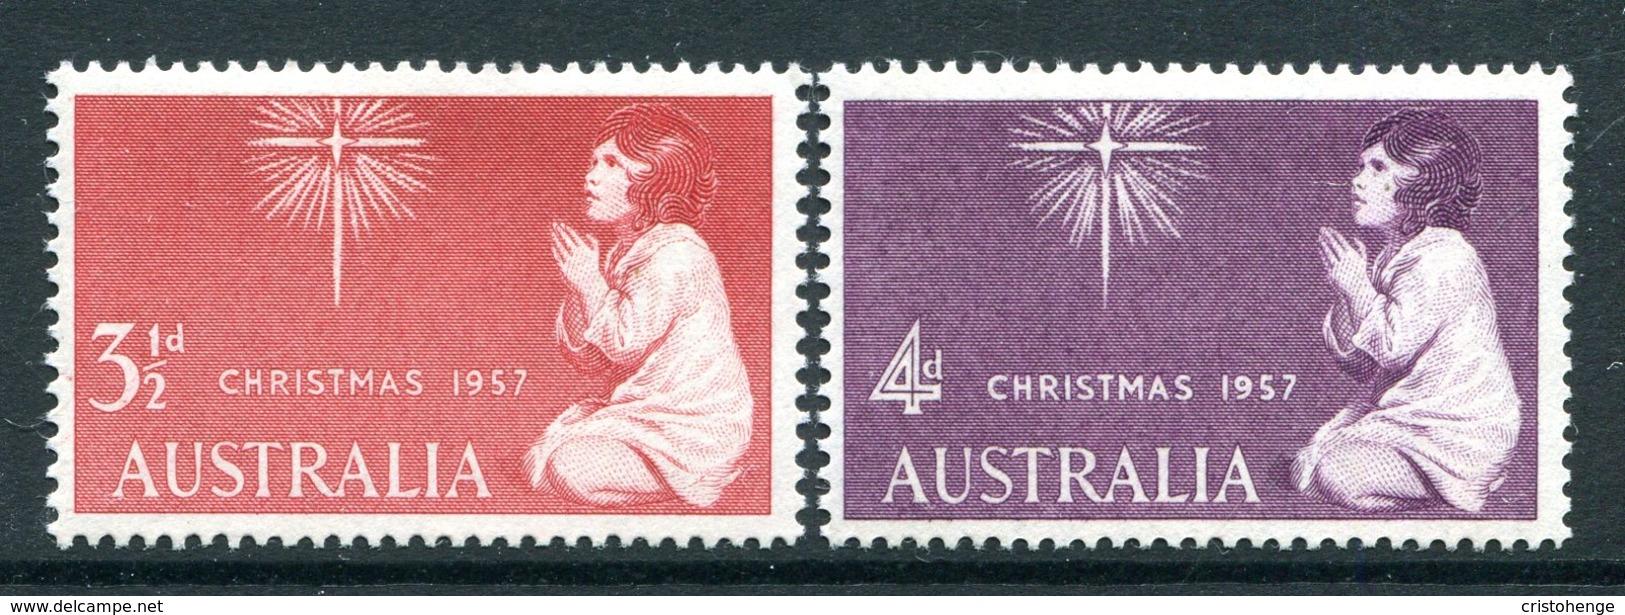 Australia 1957 Christmas Set LHM (SG 298-299) - 1952-65 Elizabeth II : Pre-Decimals